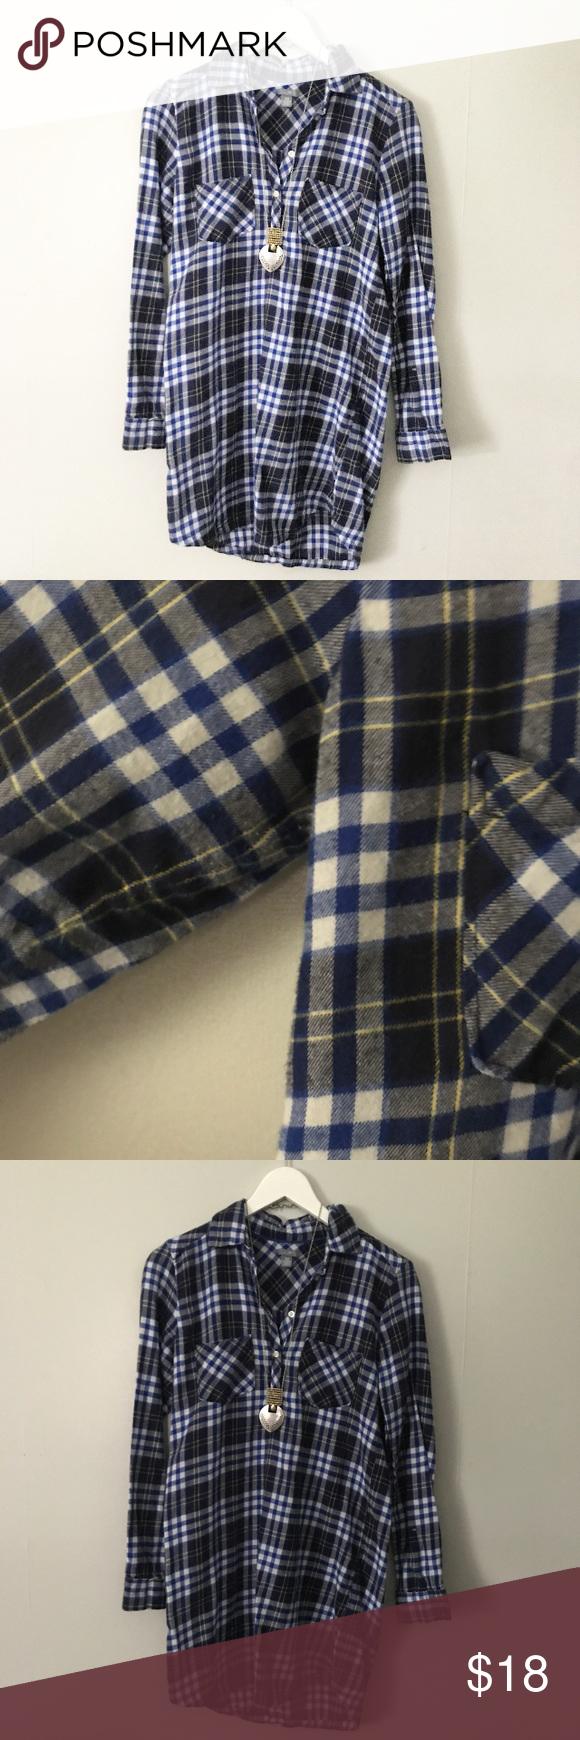 Flannel shirt xs  Aerie Blue Plaid Flannel Shirt Dress XS  Tartan Blue plaid and